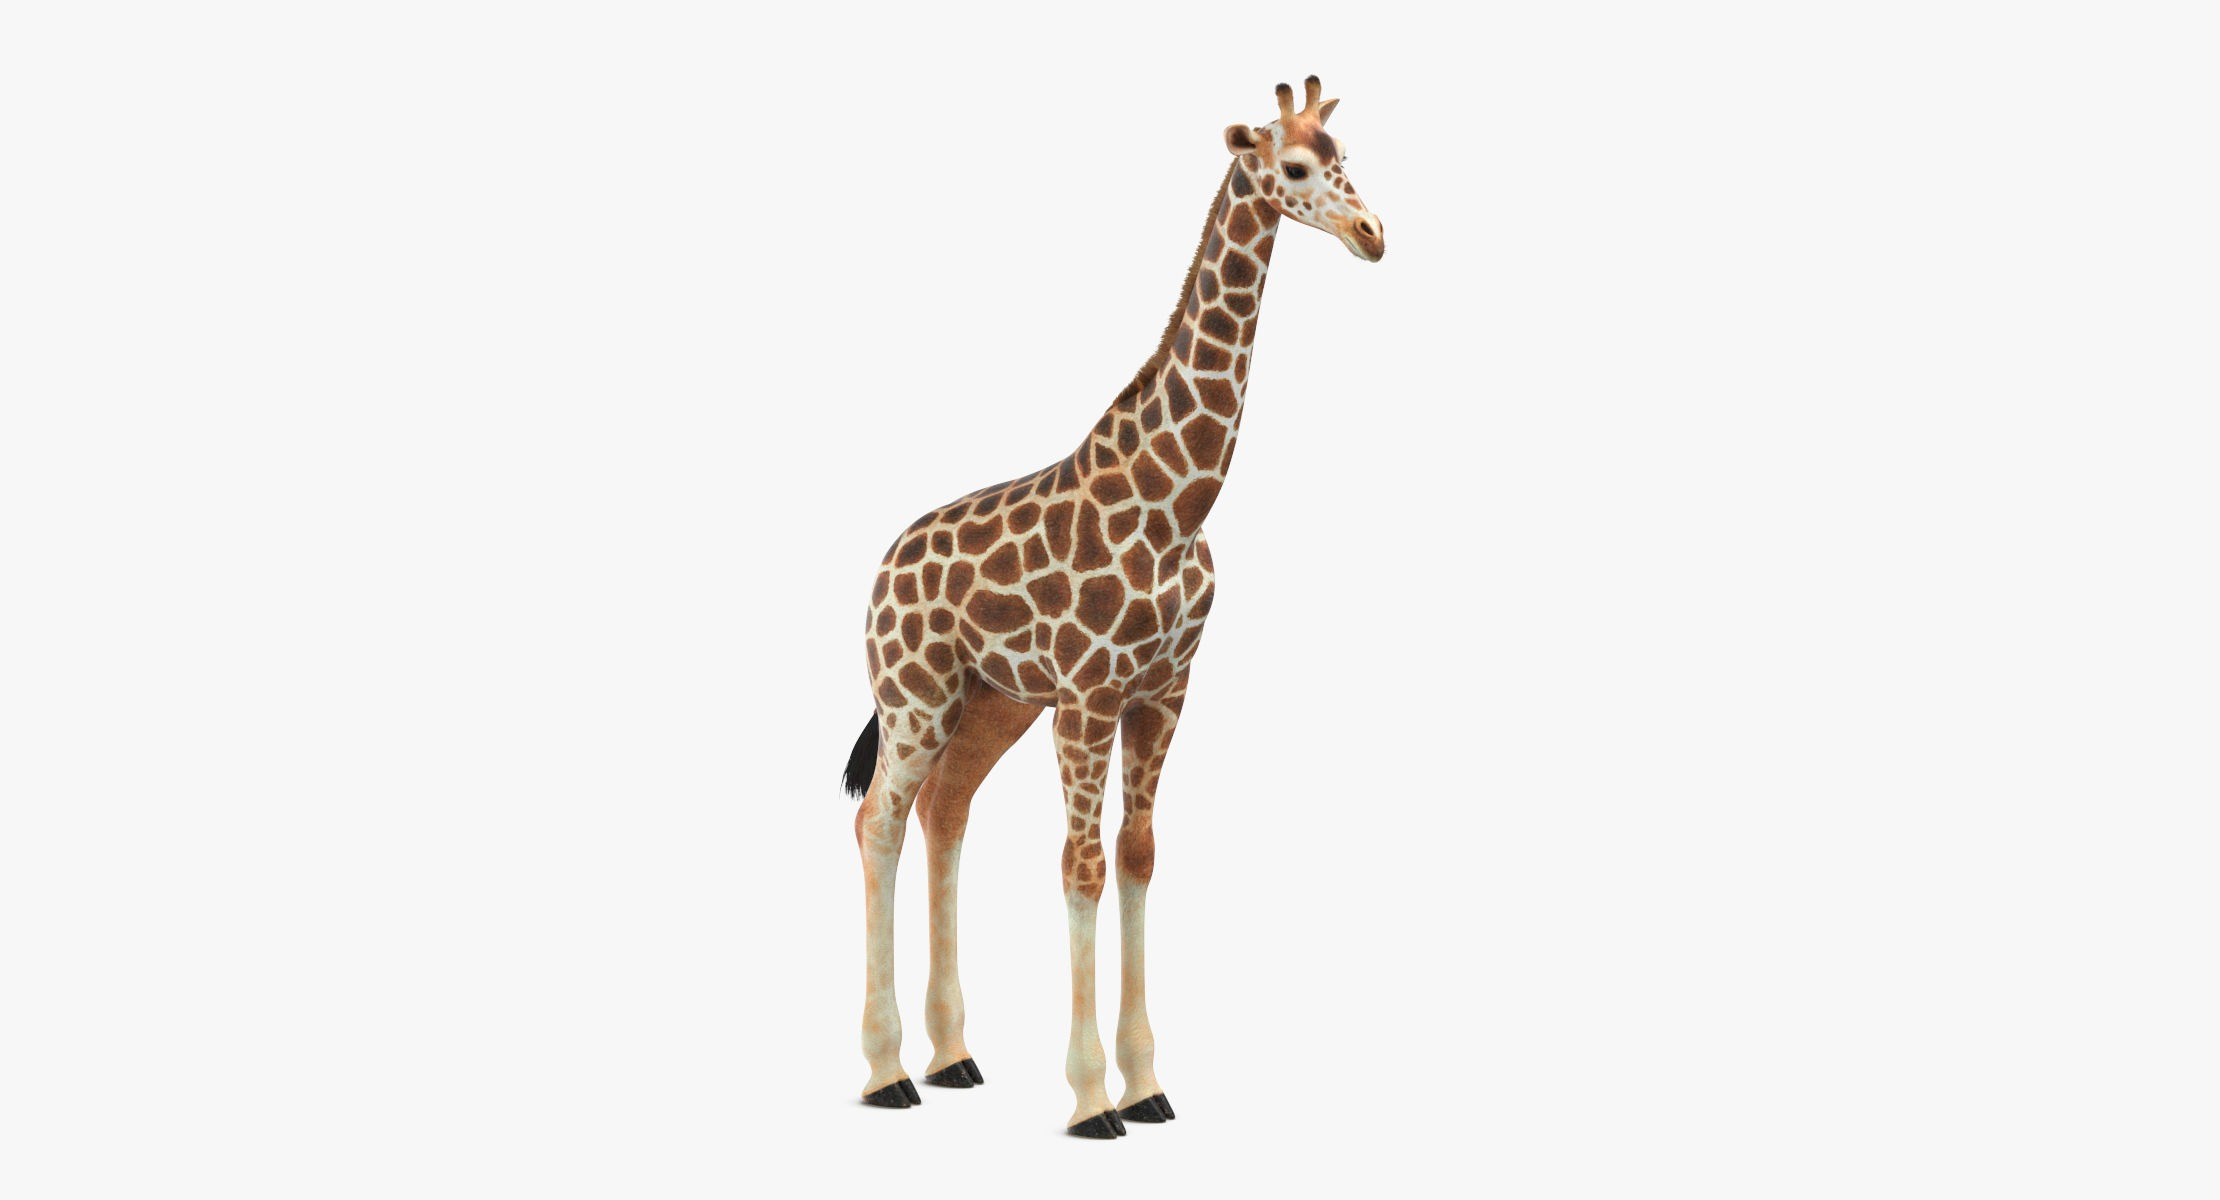 Giraffe - reel 1